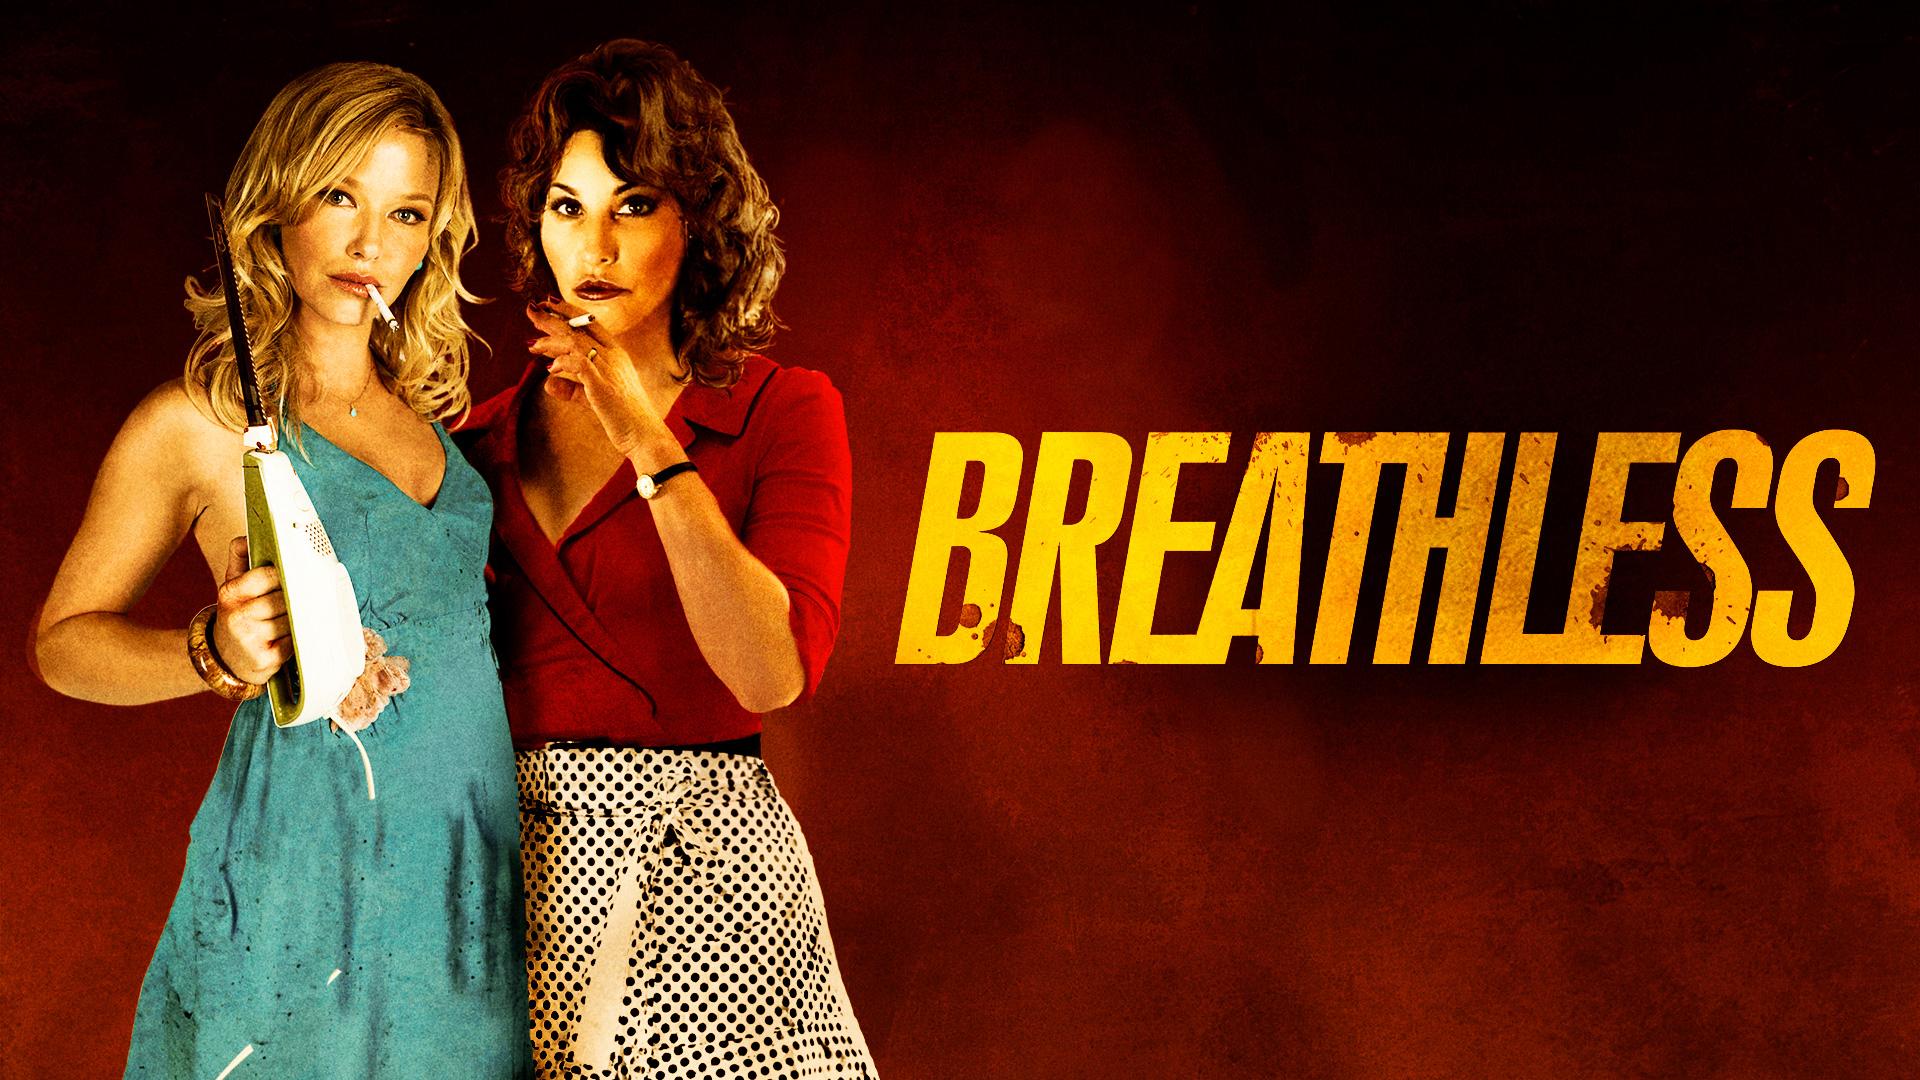 Breathless (2011)